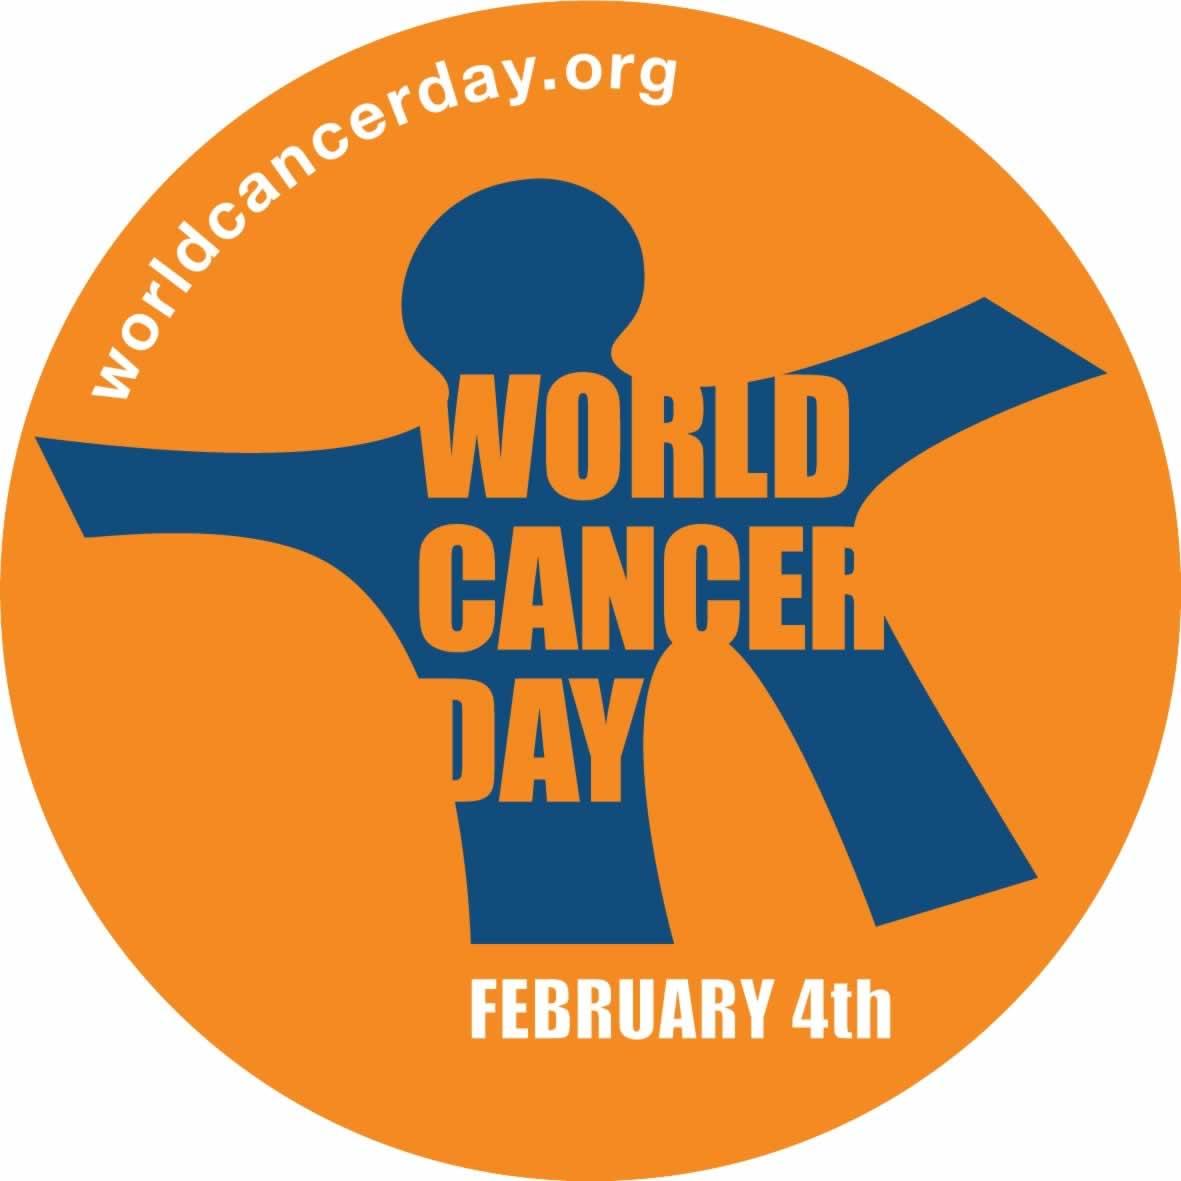 World Cancer Day February 4 - worldcancerday.org